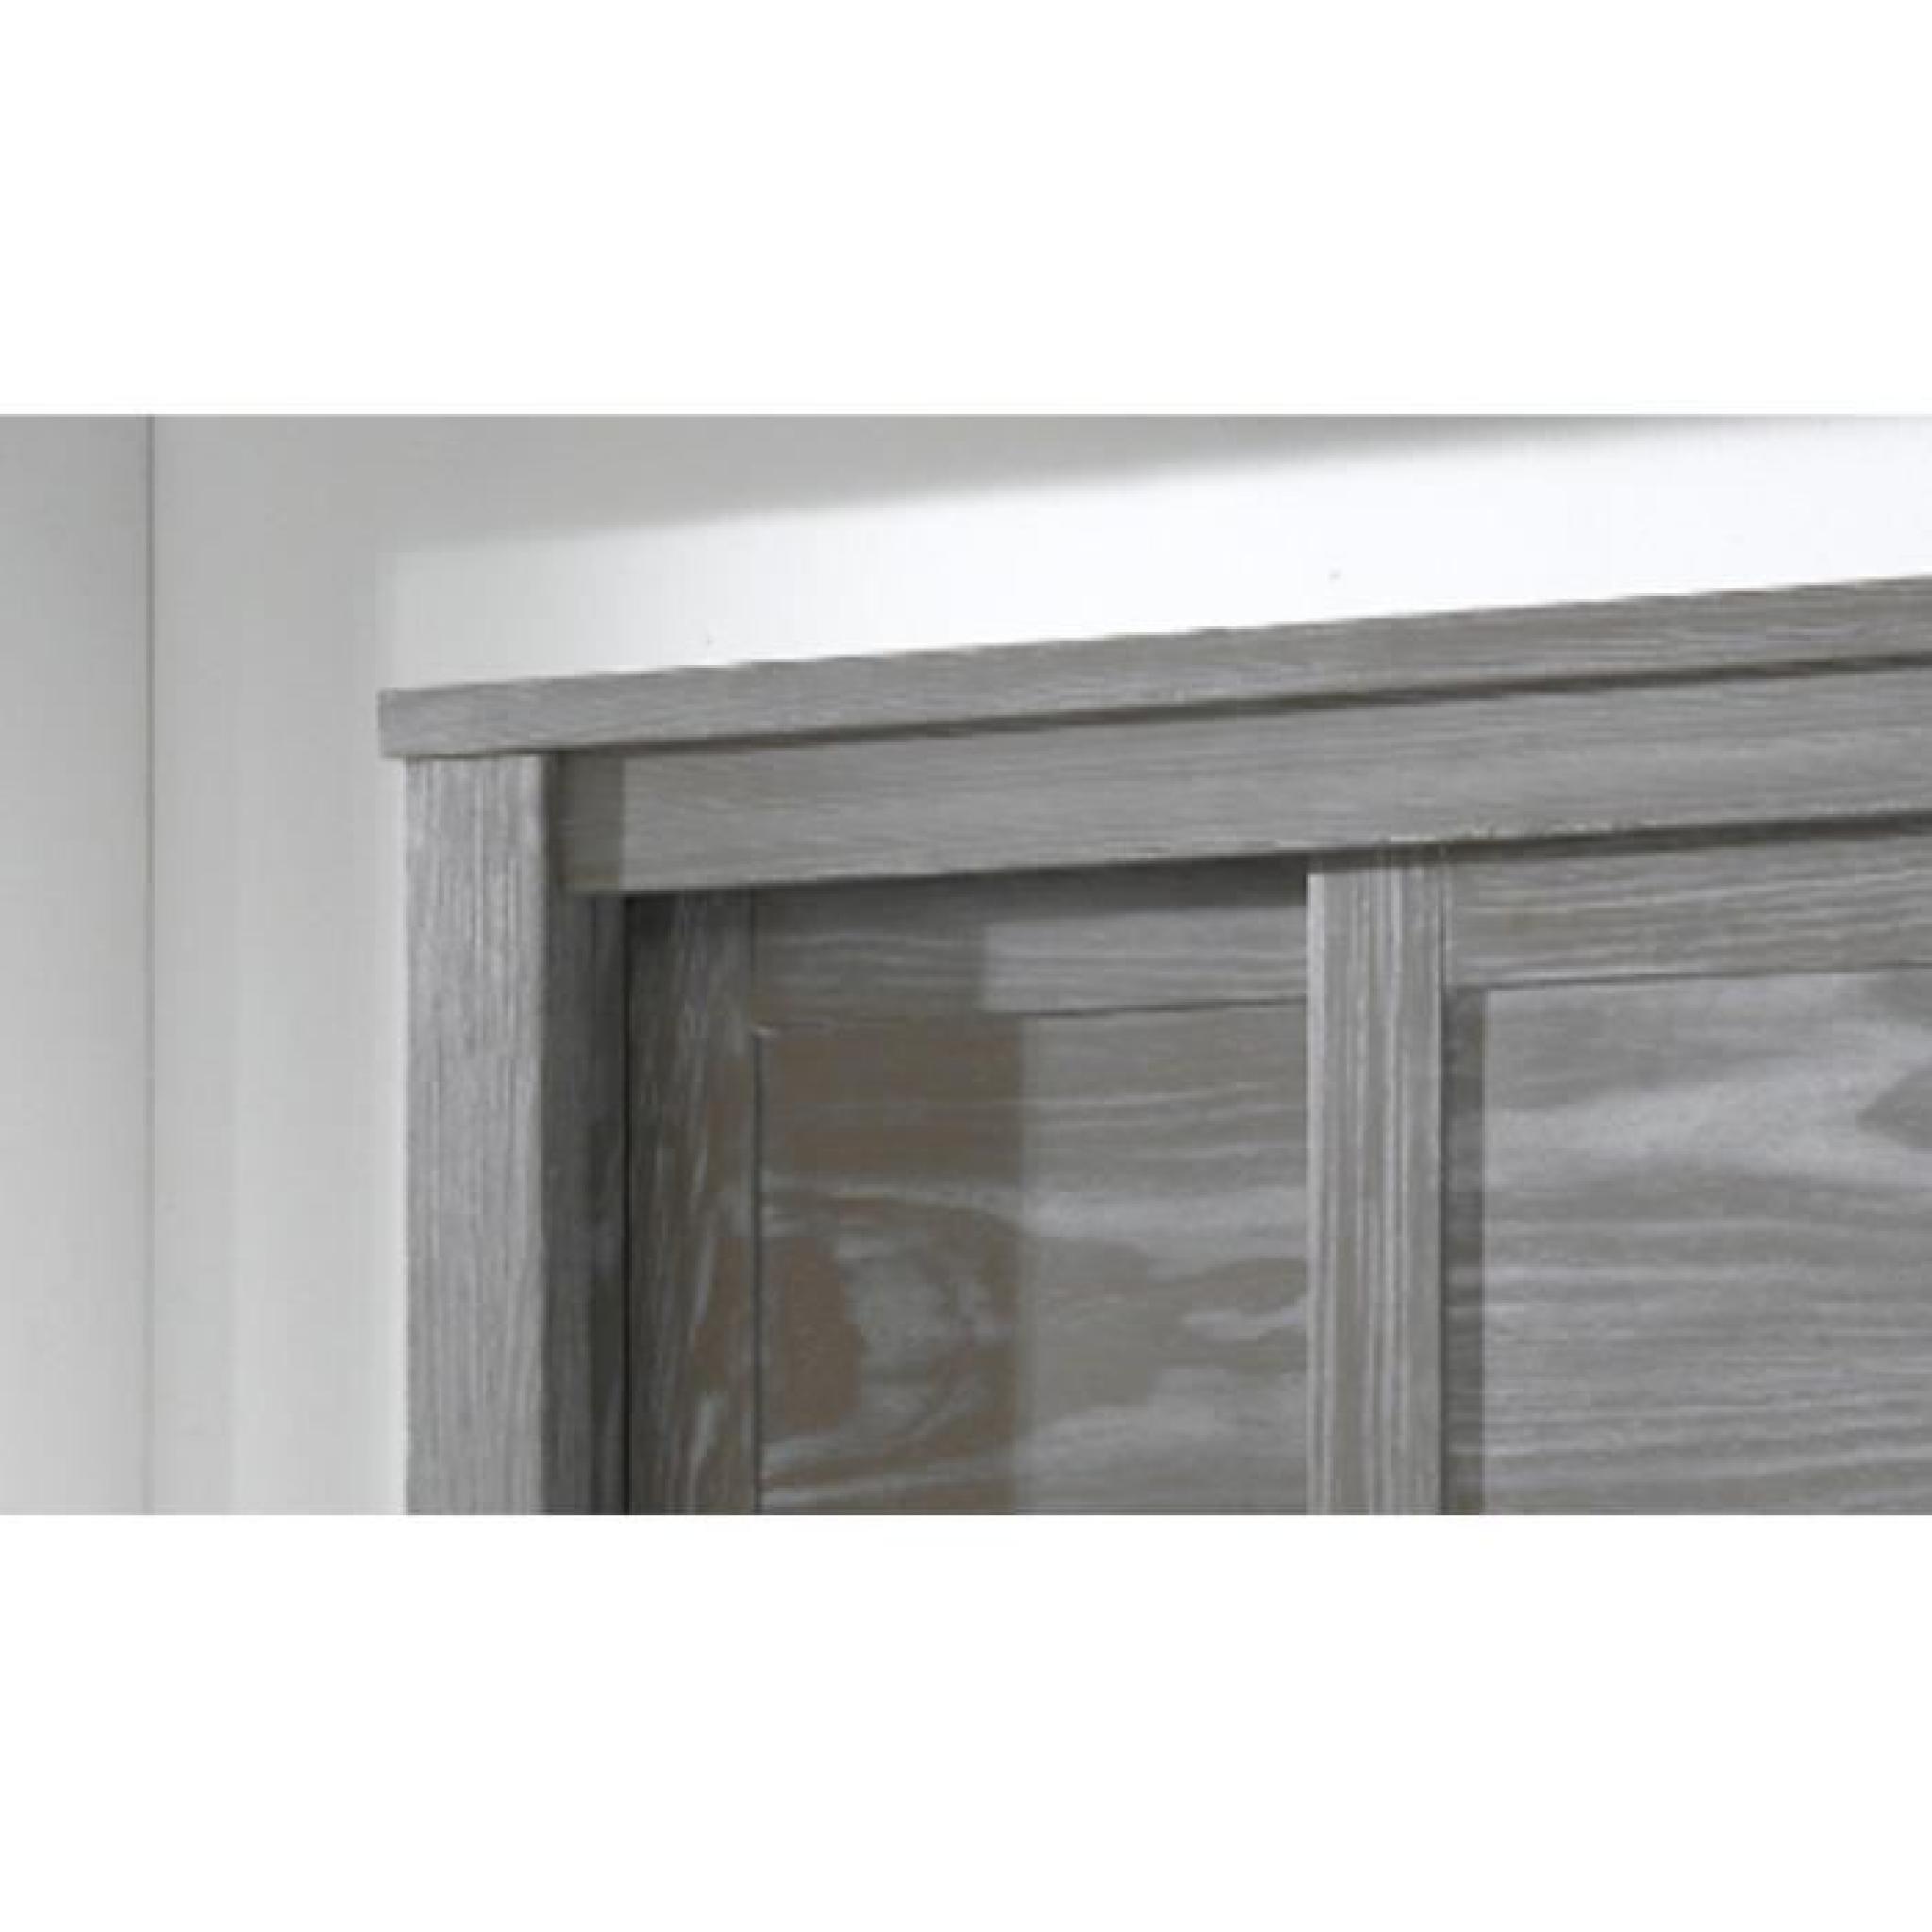 armoire 2 portes wilda en pin massif verni incolore. Black Bedroom Furniture Sets. Home Design Ideas